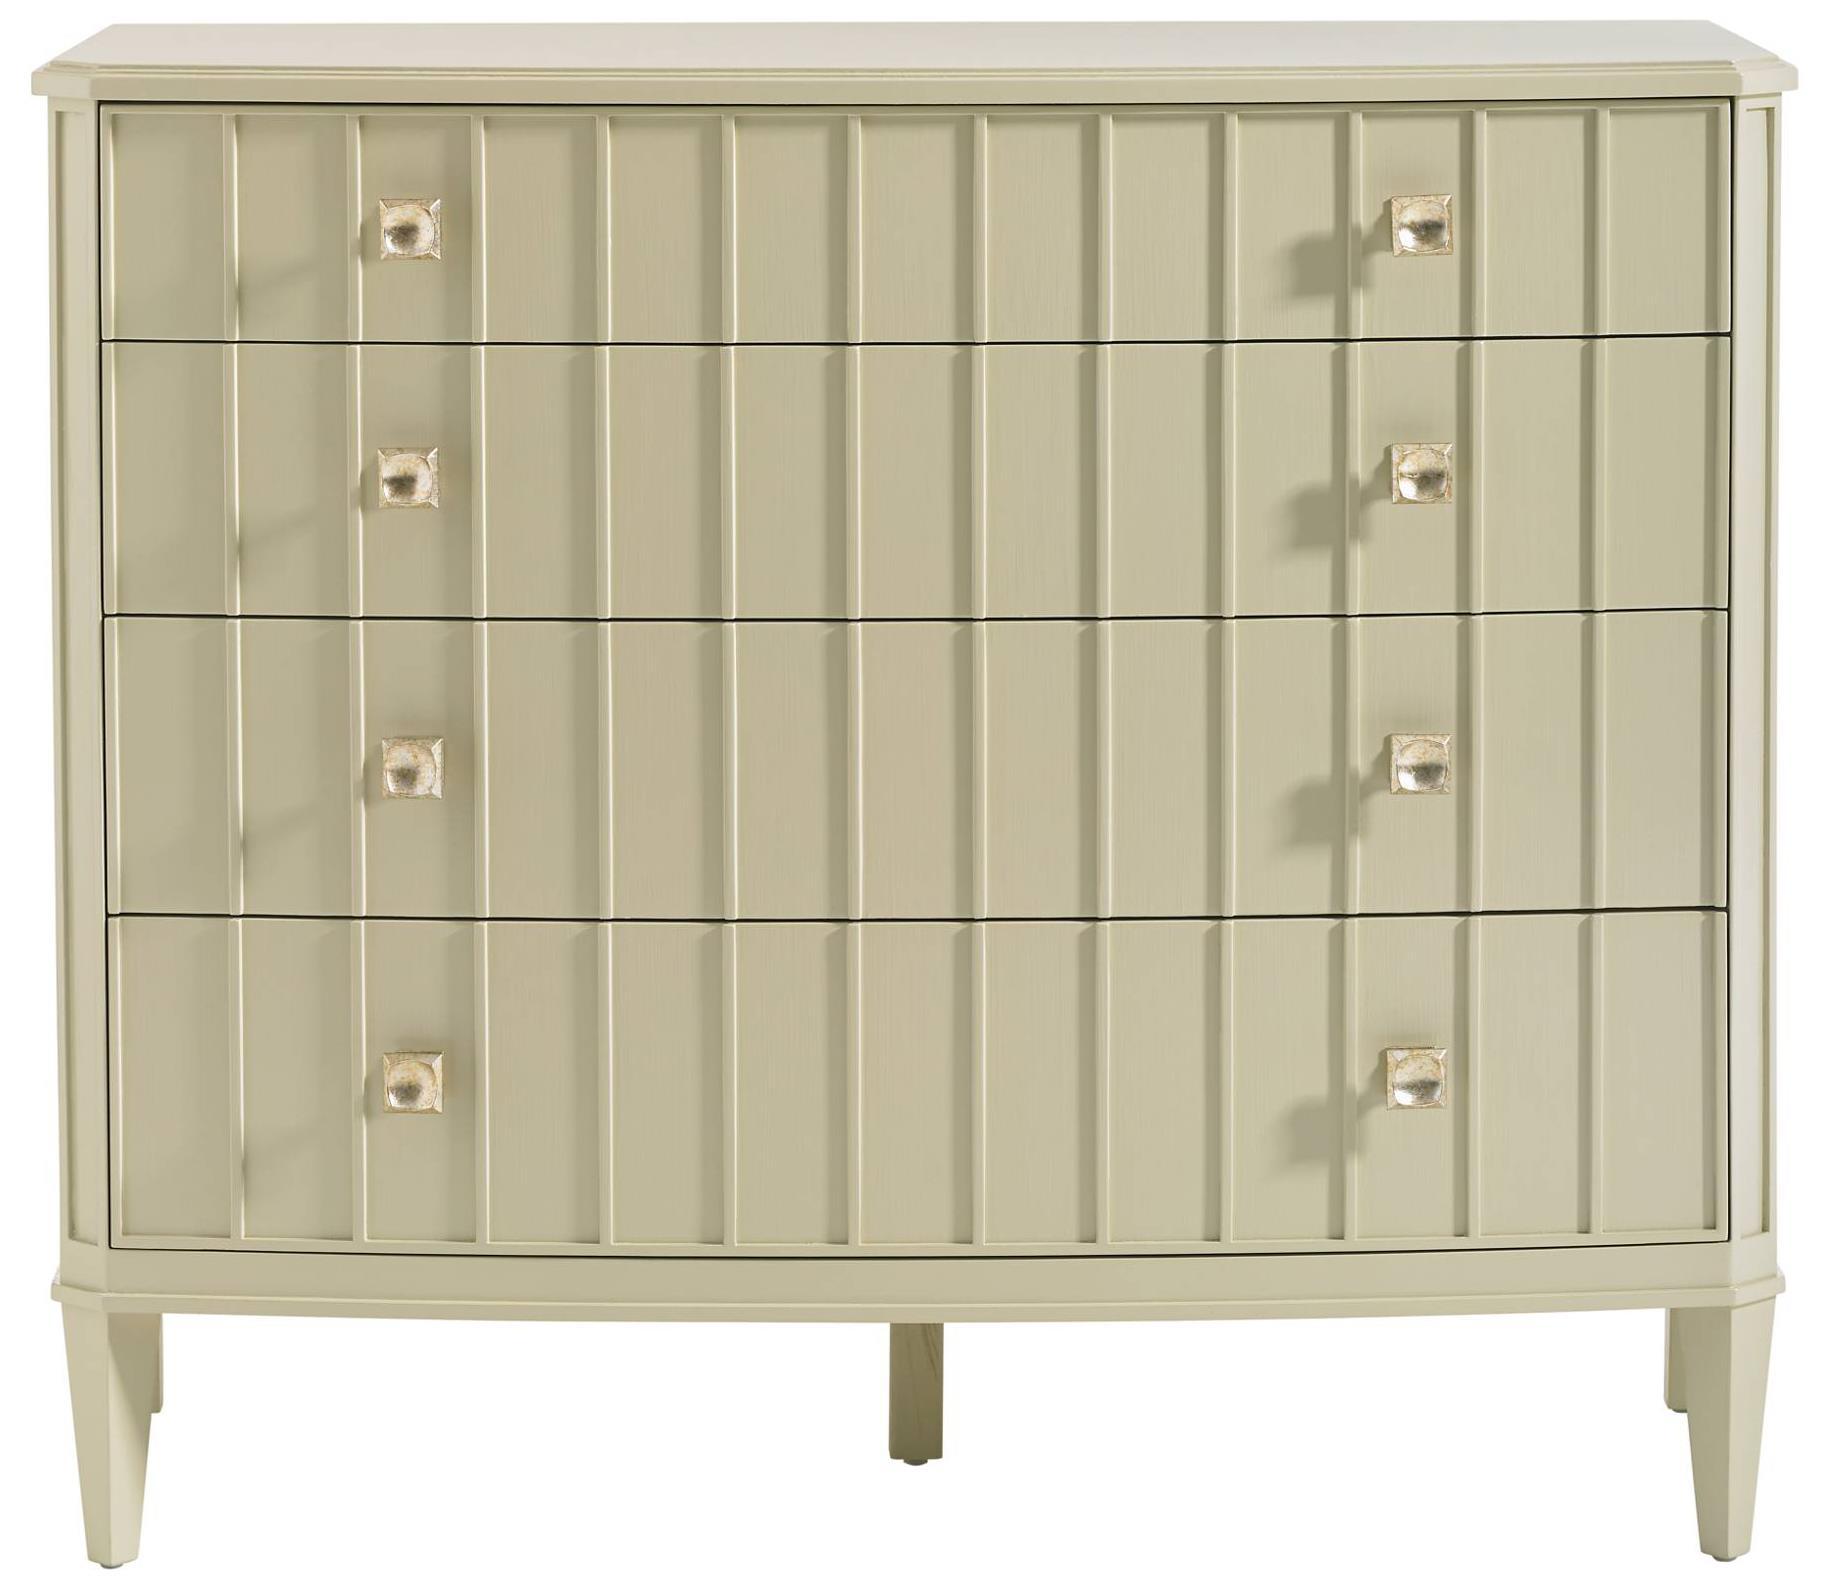 Stanley Furniture Crestaire Monterey Single Dresser - Item Number: 436-23-04